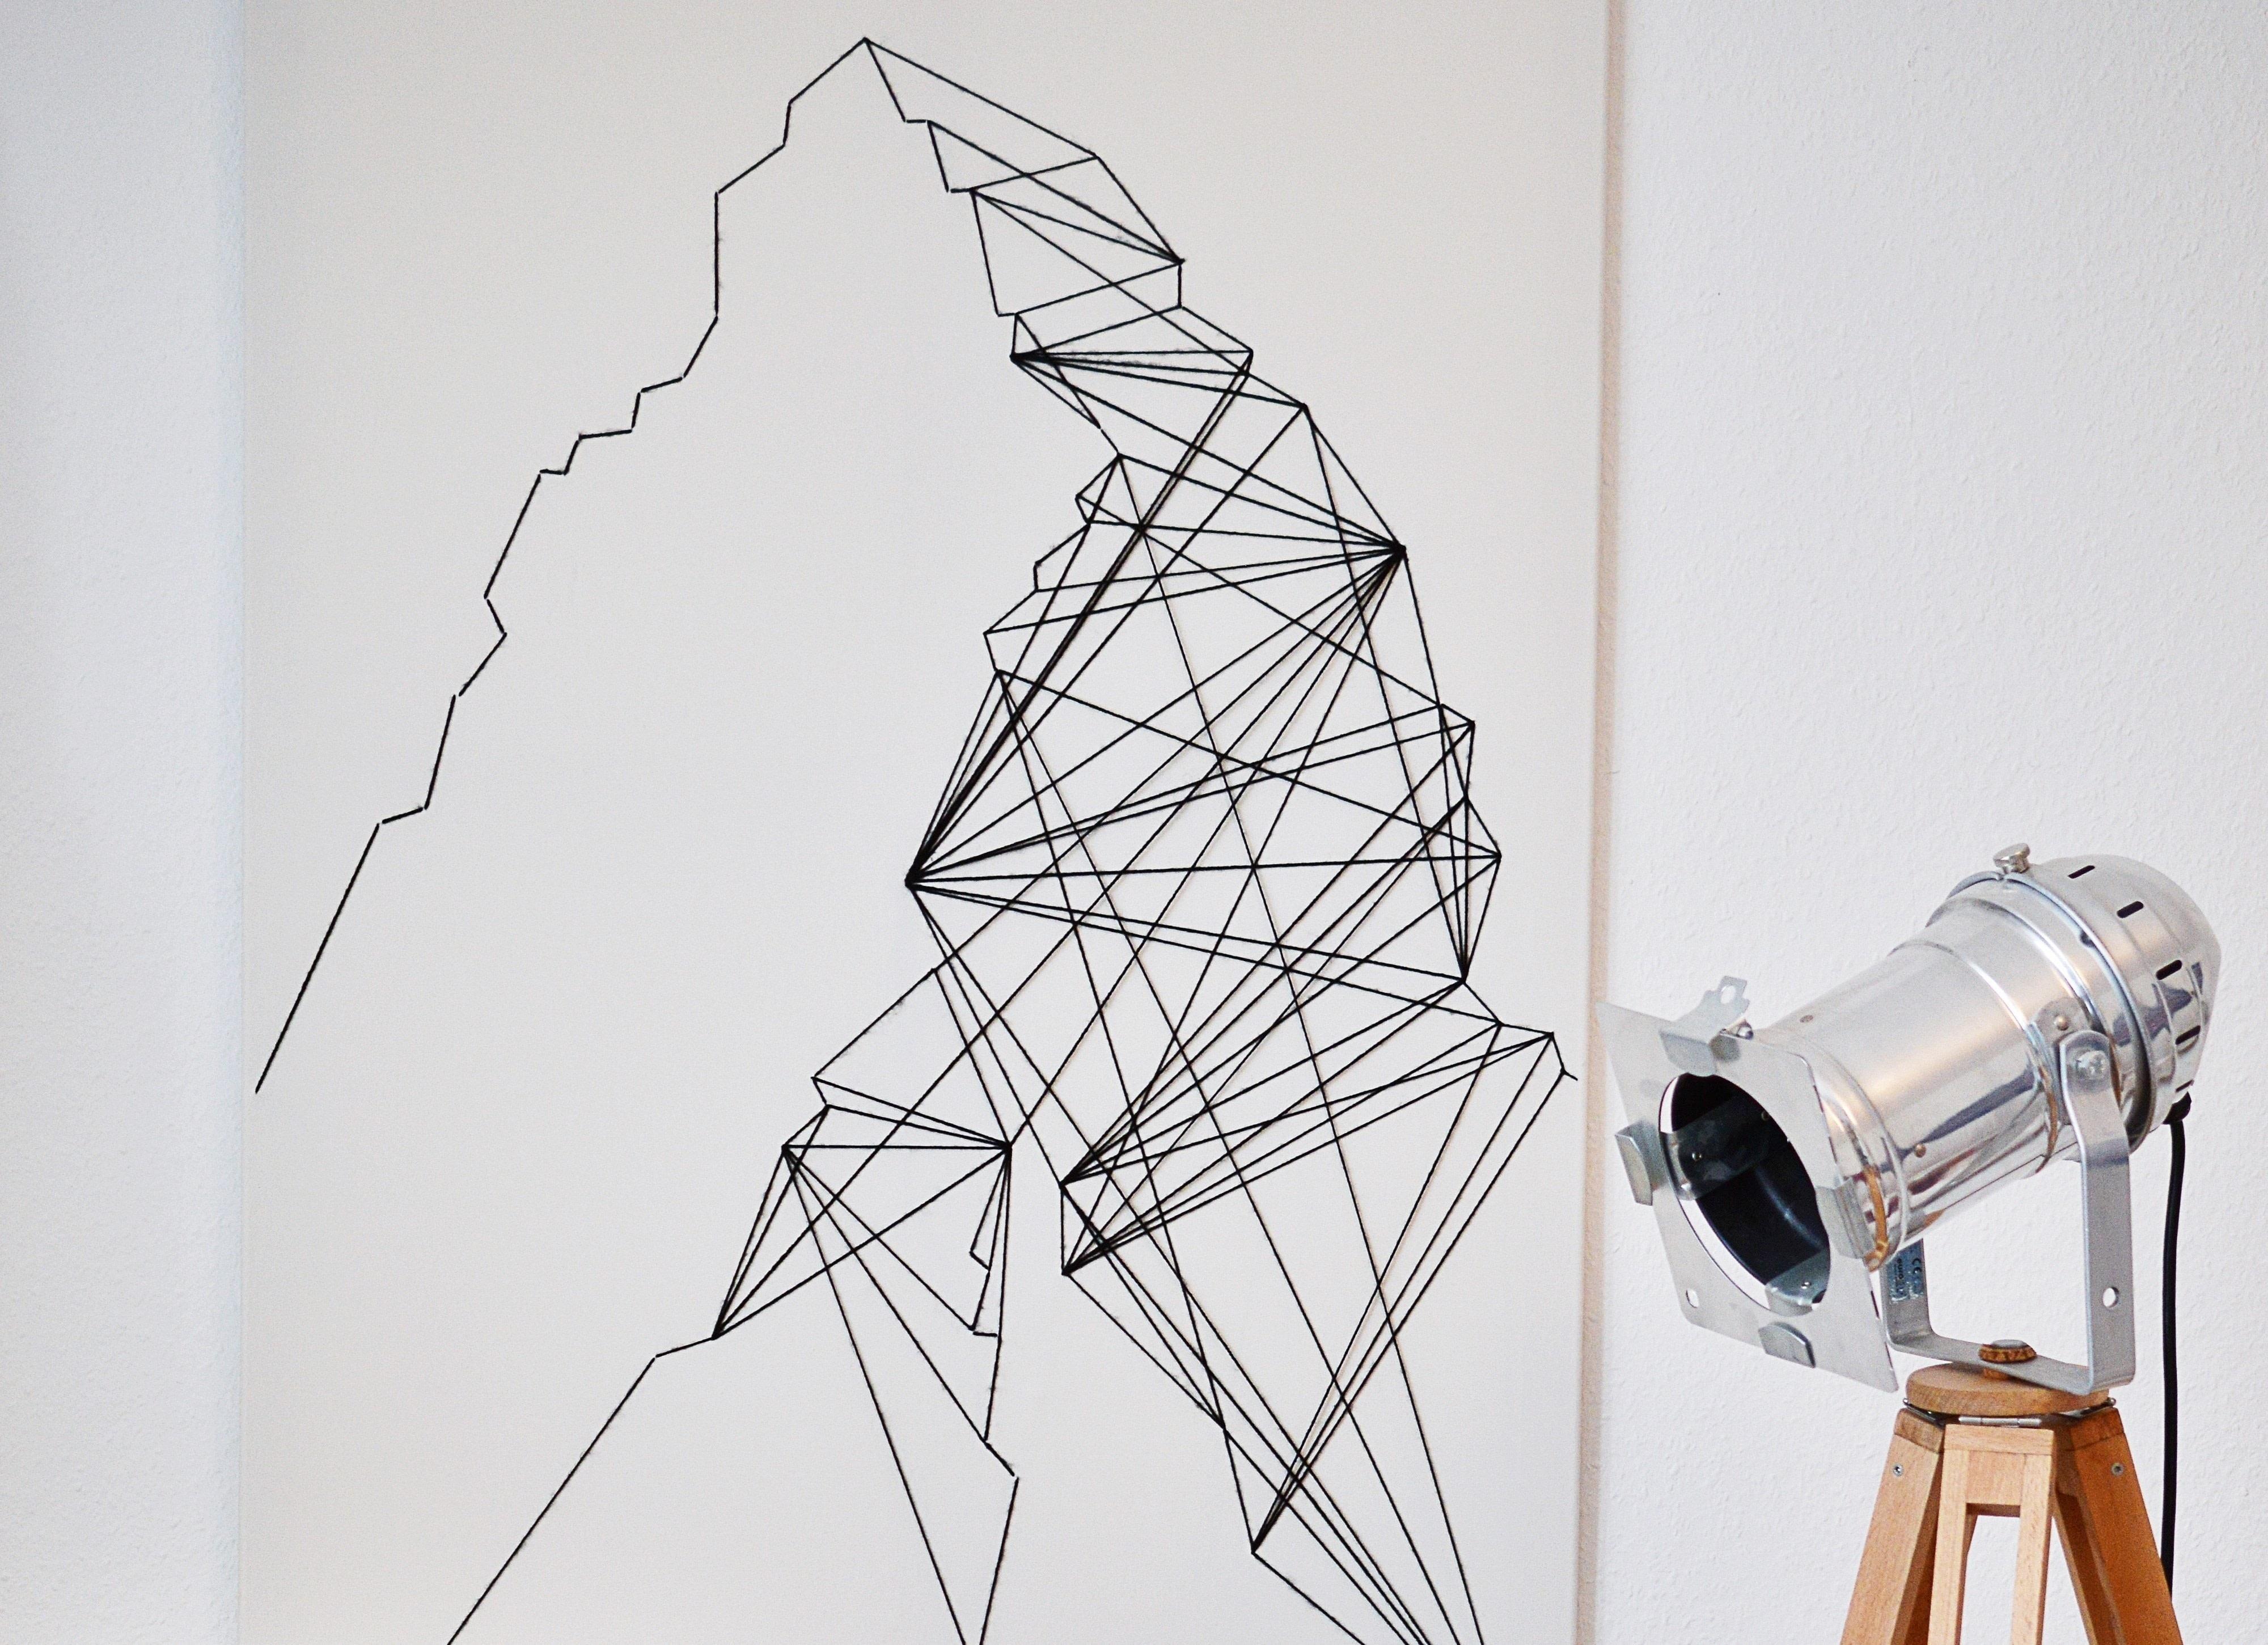 String Wall Art geometric wall art · how to make string art · needlework on cut